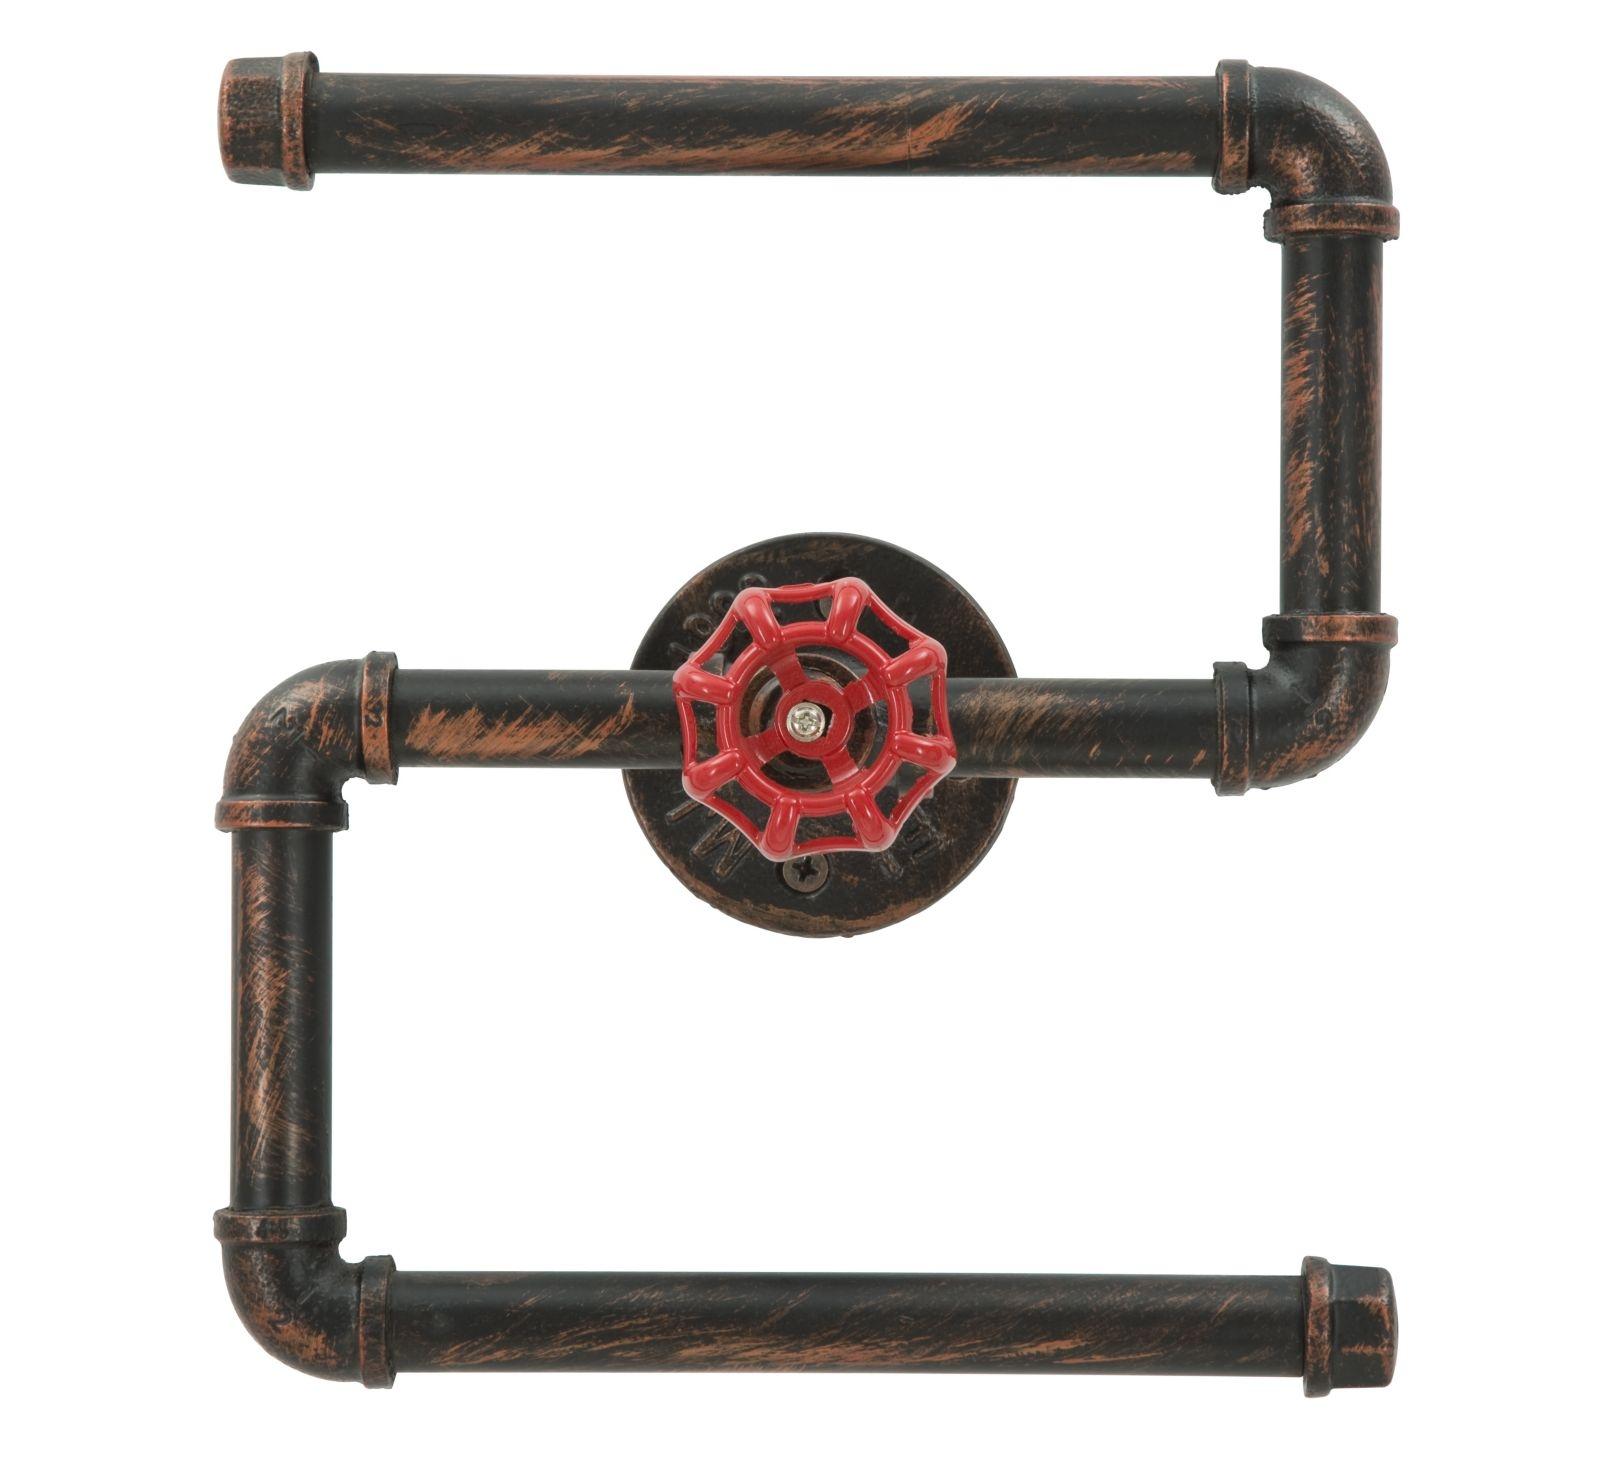 Suport metalic pentru hartie igienica Manhattan Double Black / Red l24xA11xH27 cm